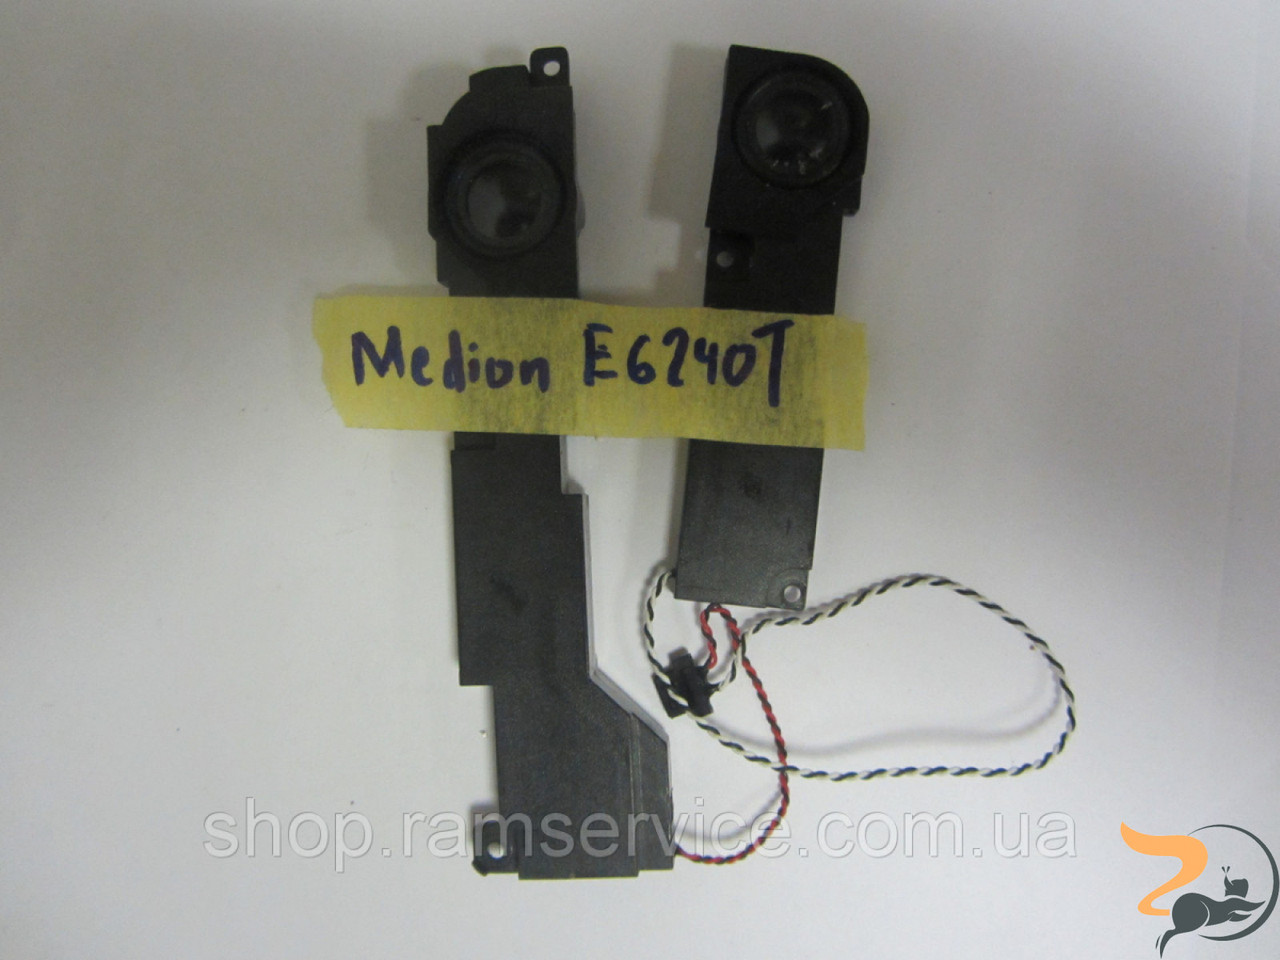 Динаміки Medion E6240T, б/в